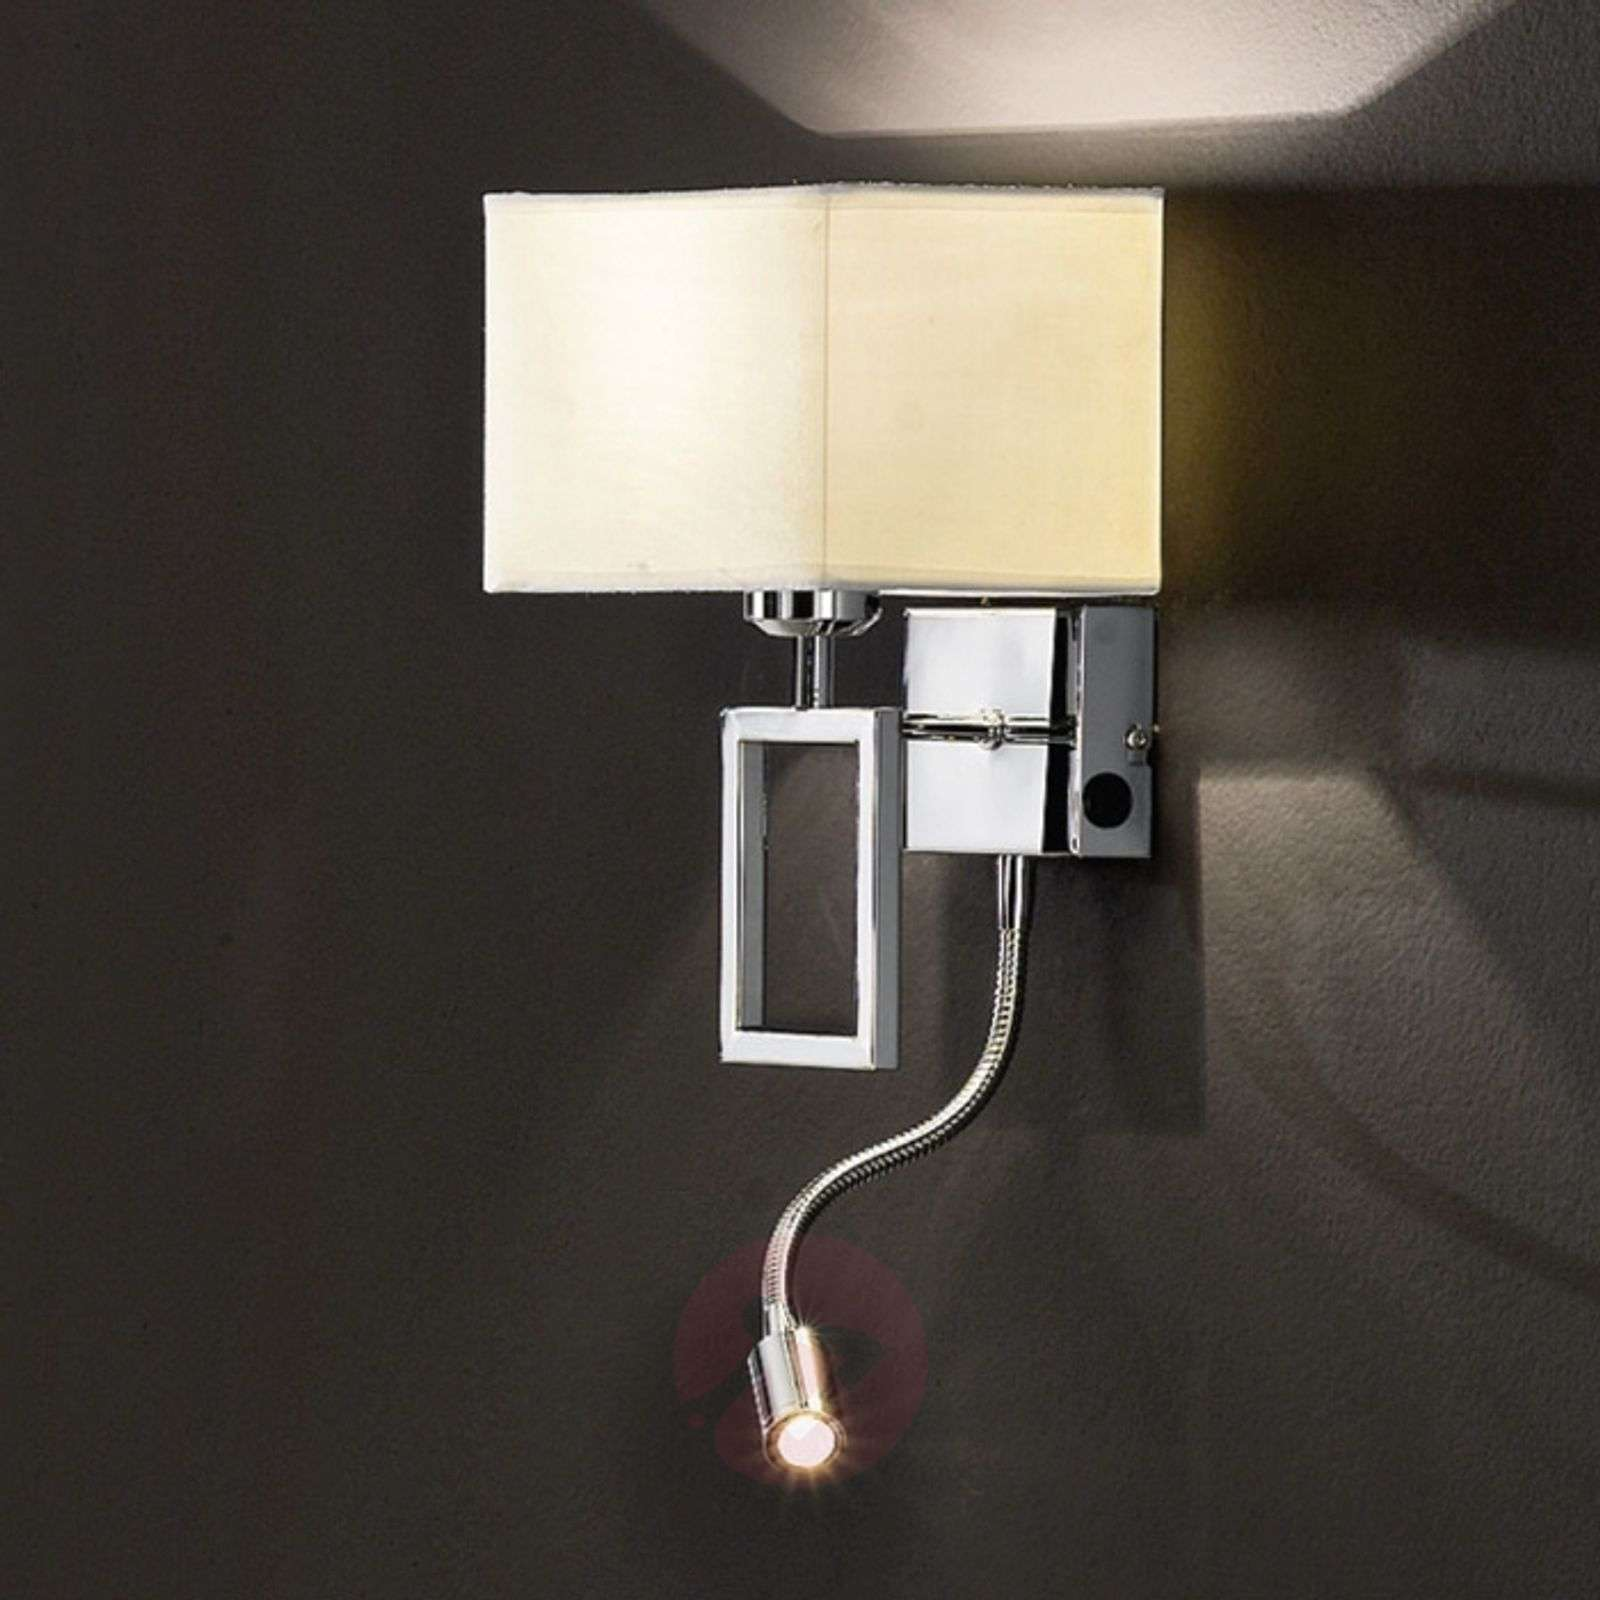 Renee-seinävalaisin LED-lukulampulla-7254458-01